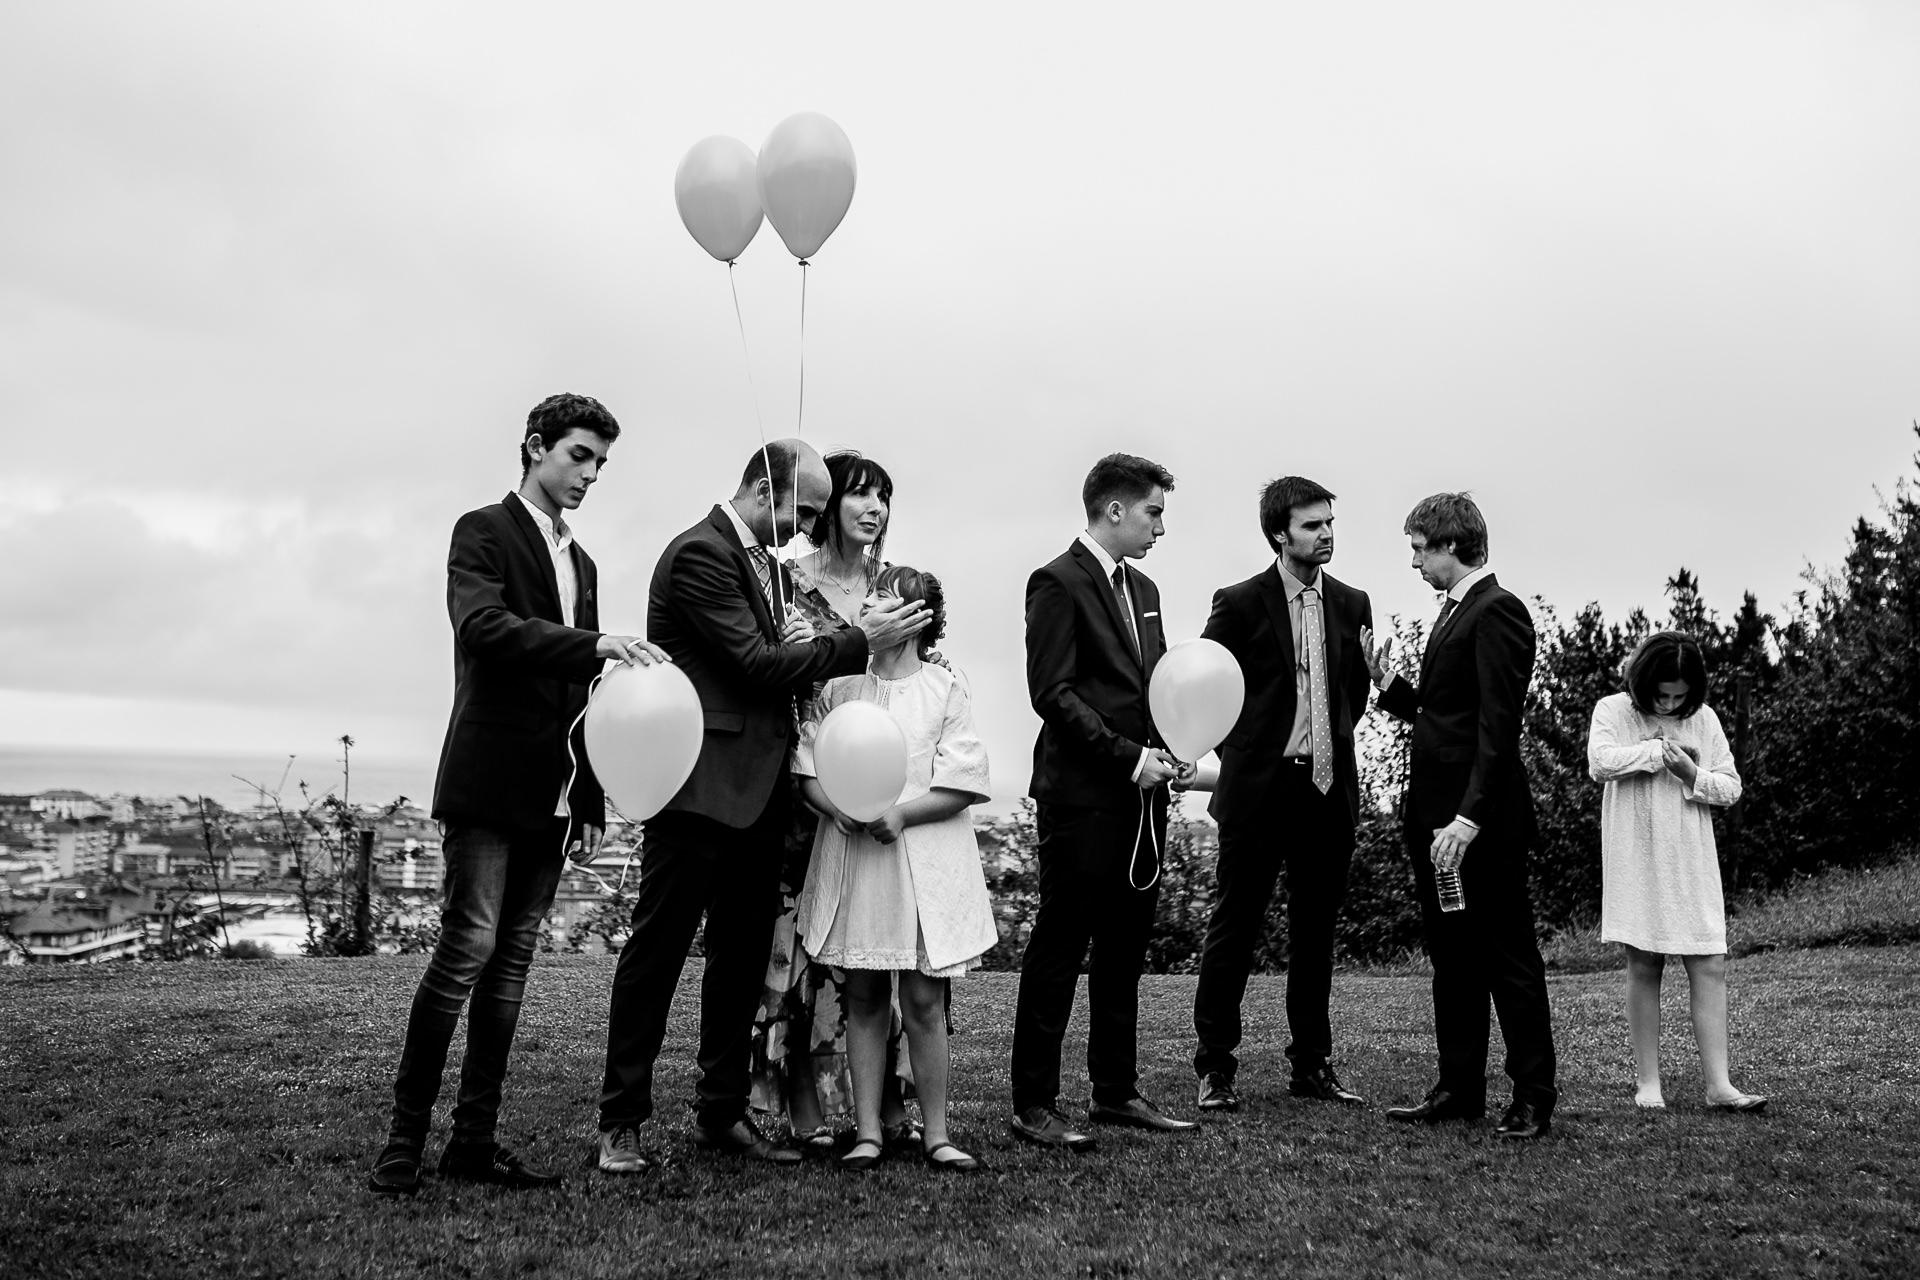 boda civil sagardotegi sidrería arizia zarautz 132840